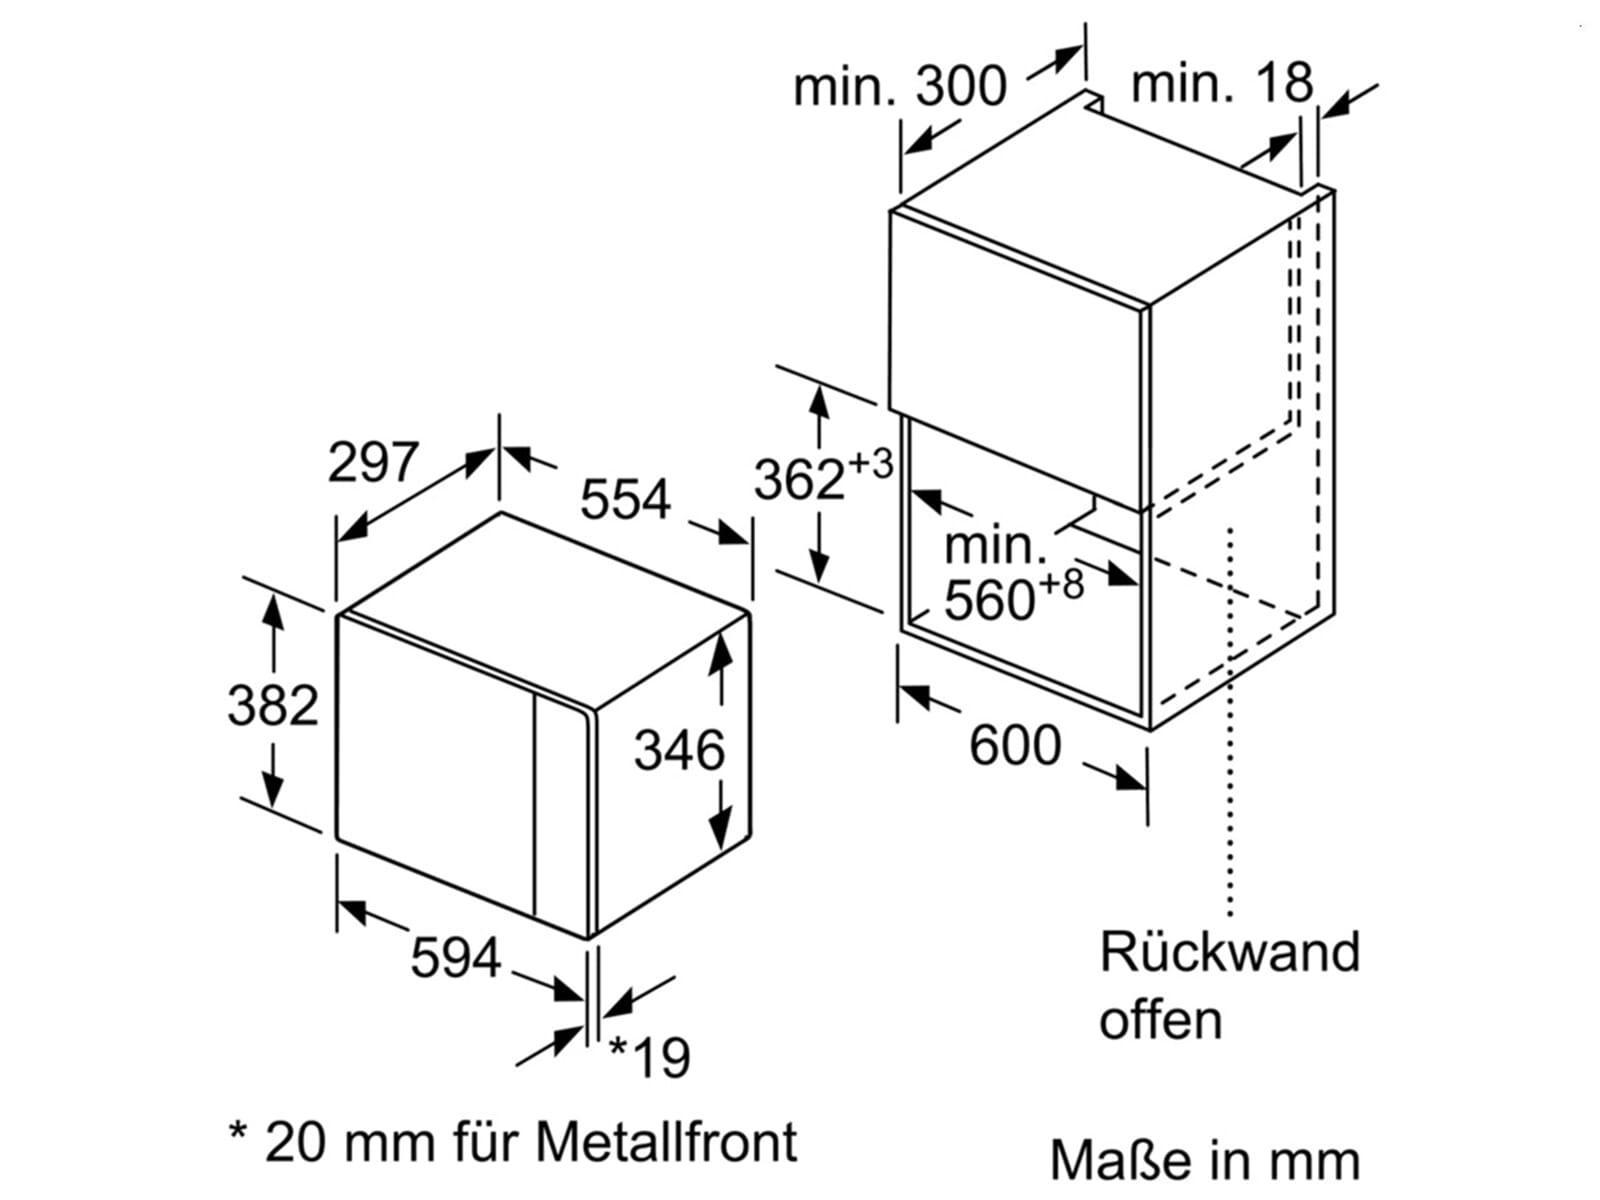 bosch bfl524mb0 einbau mikrowelle vulkan schwarz. Black Bedroom Furniture Sets. Home Design Ideas